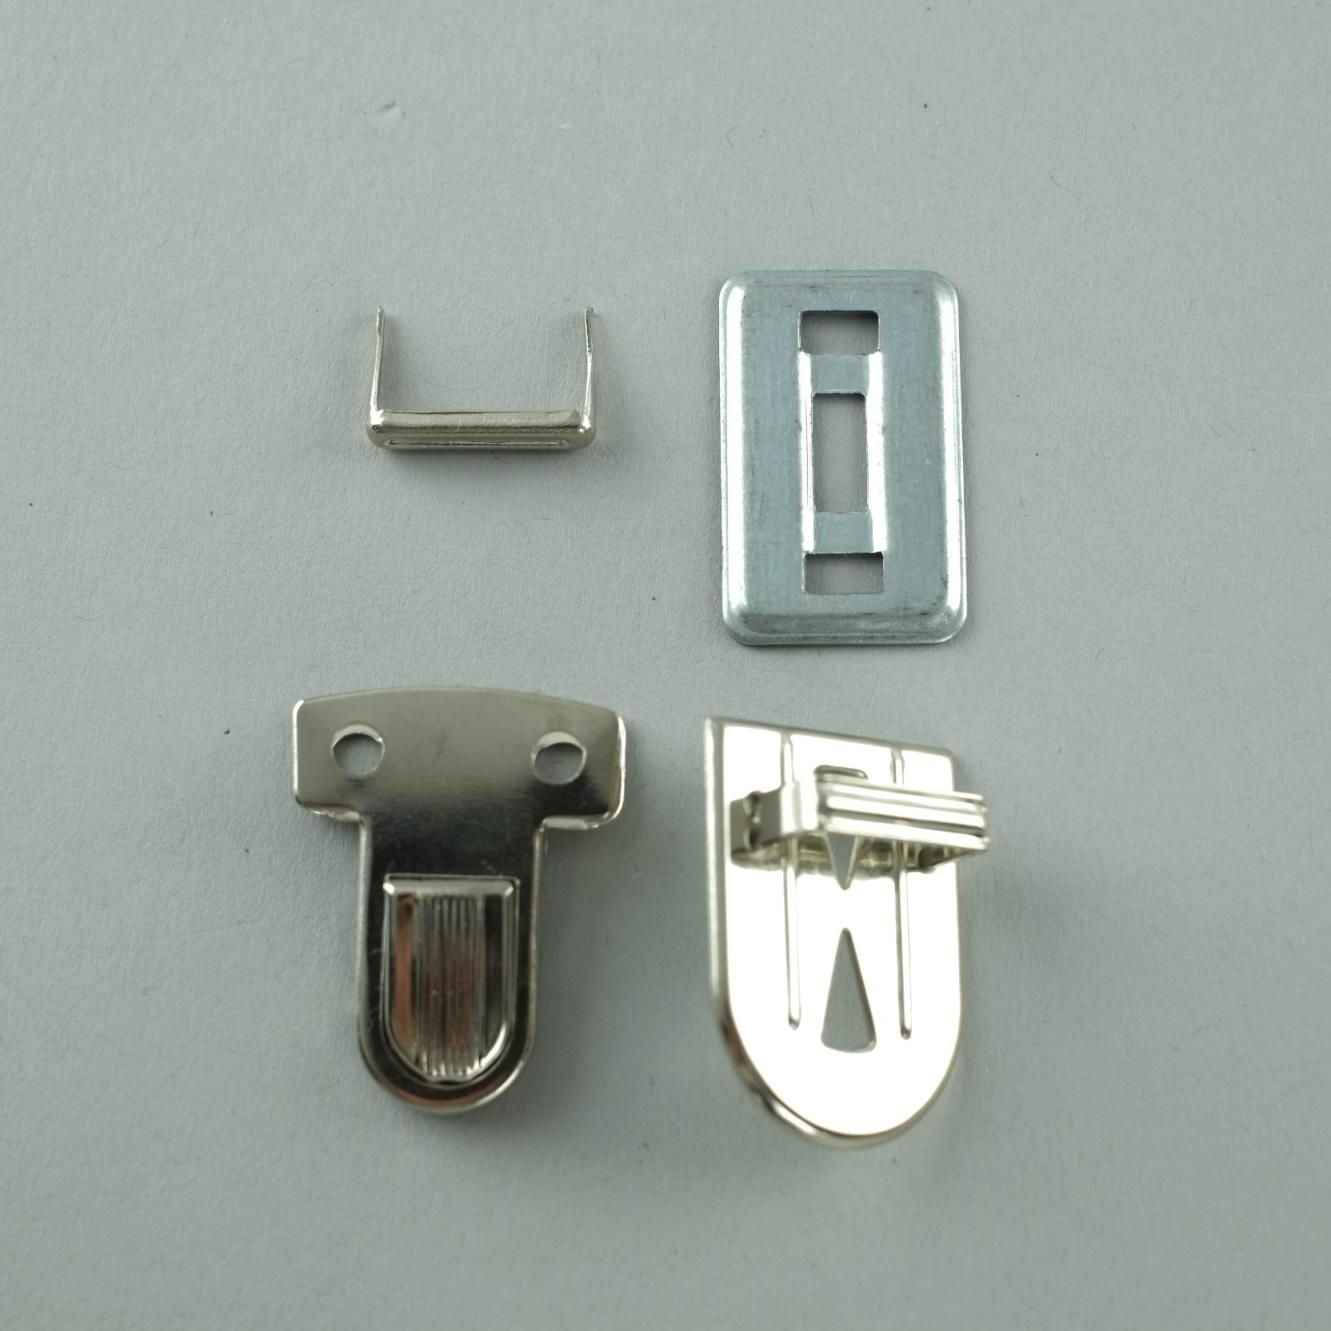 3792b9936d5 Home/Tassen accessoires/Tassen accessoires/Kliksluiting. ; 